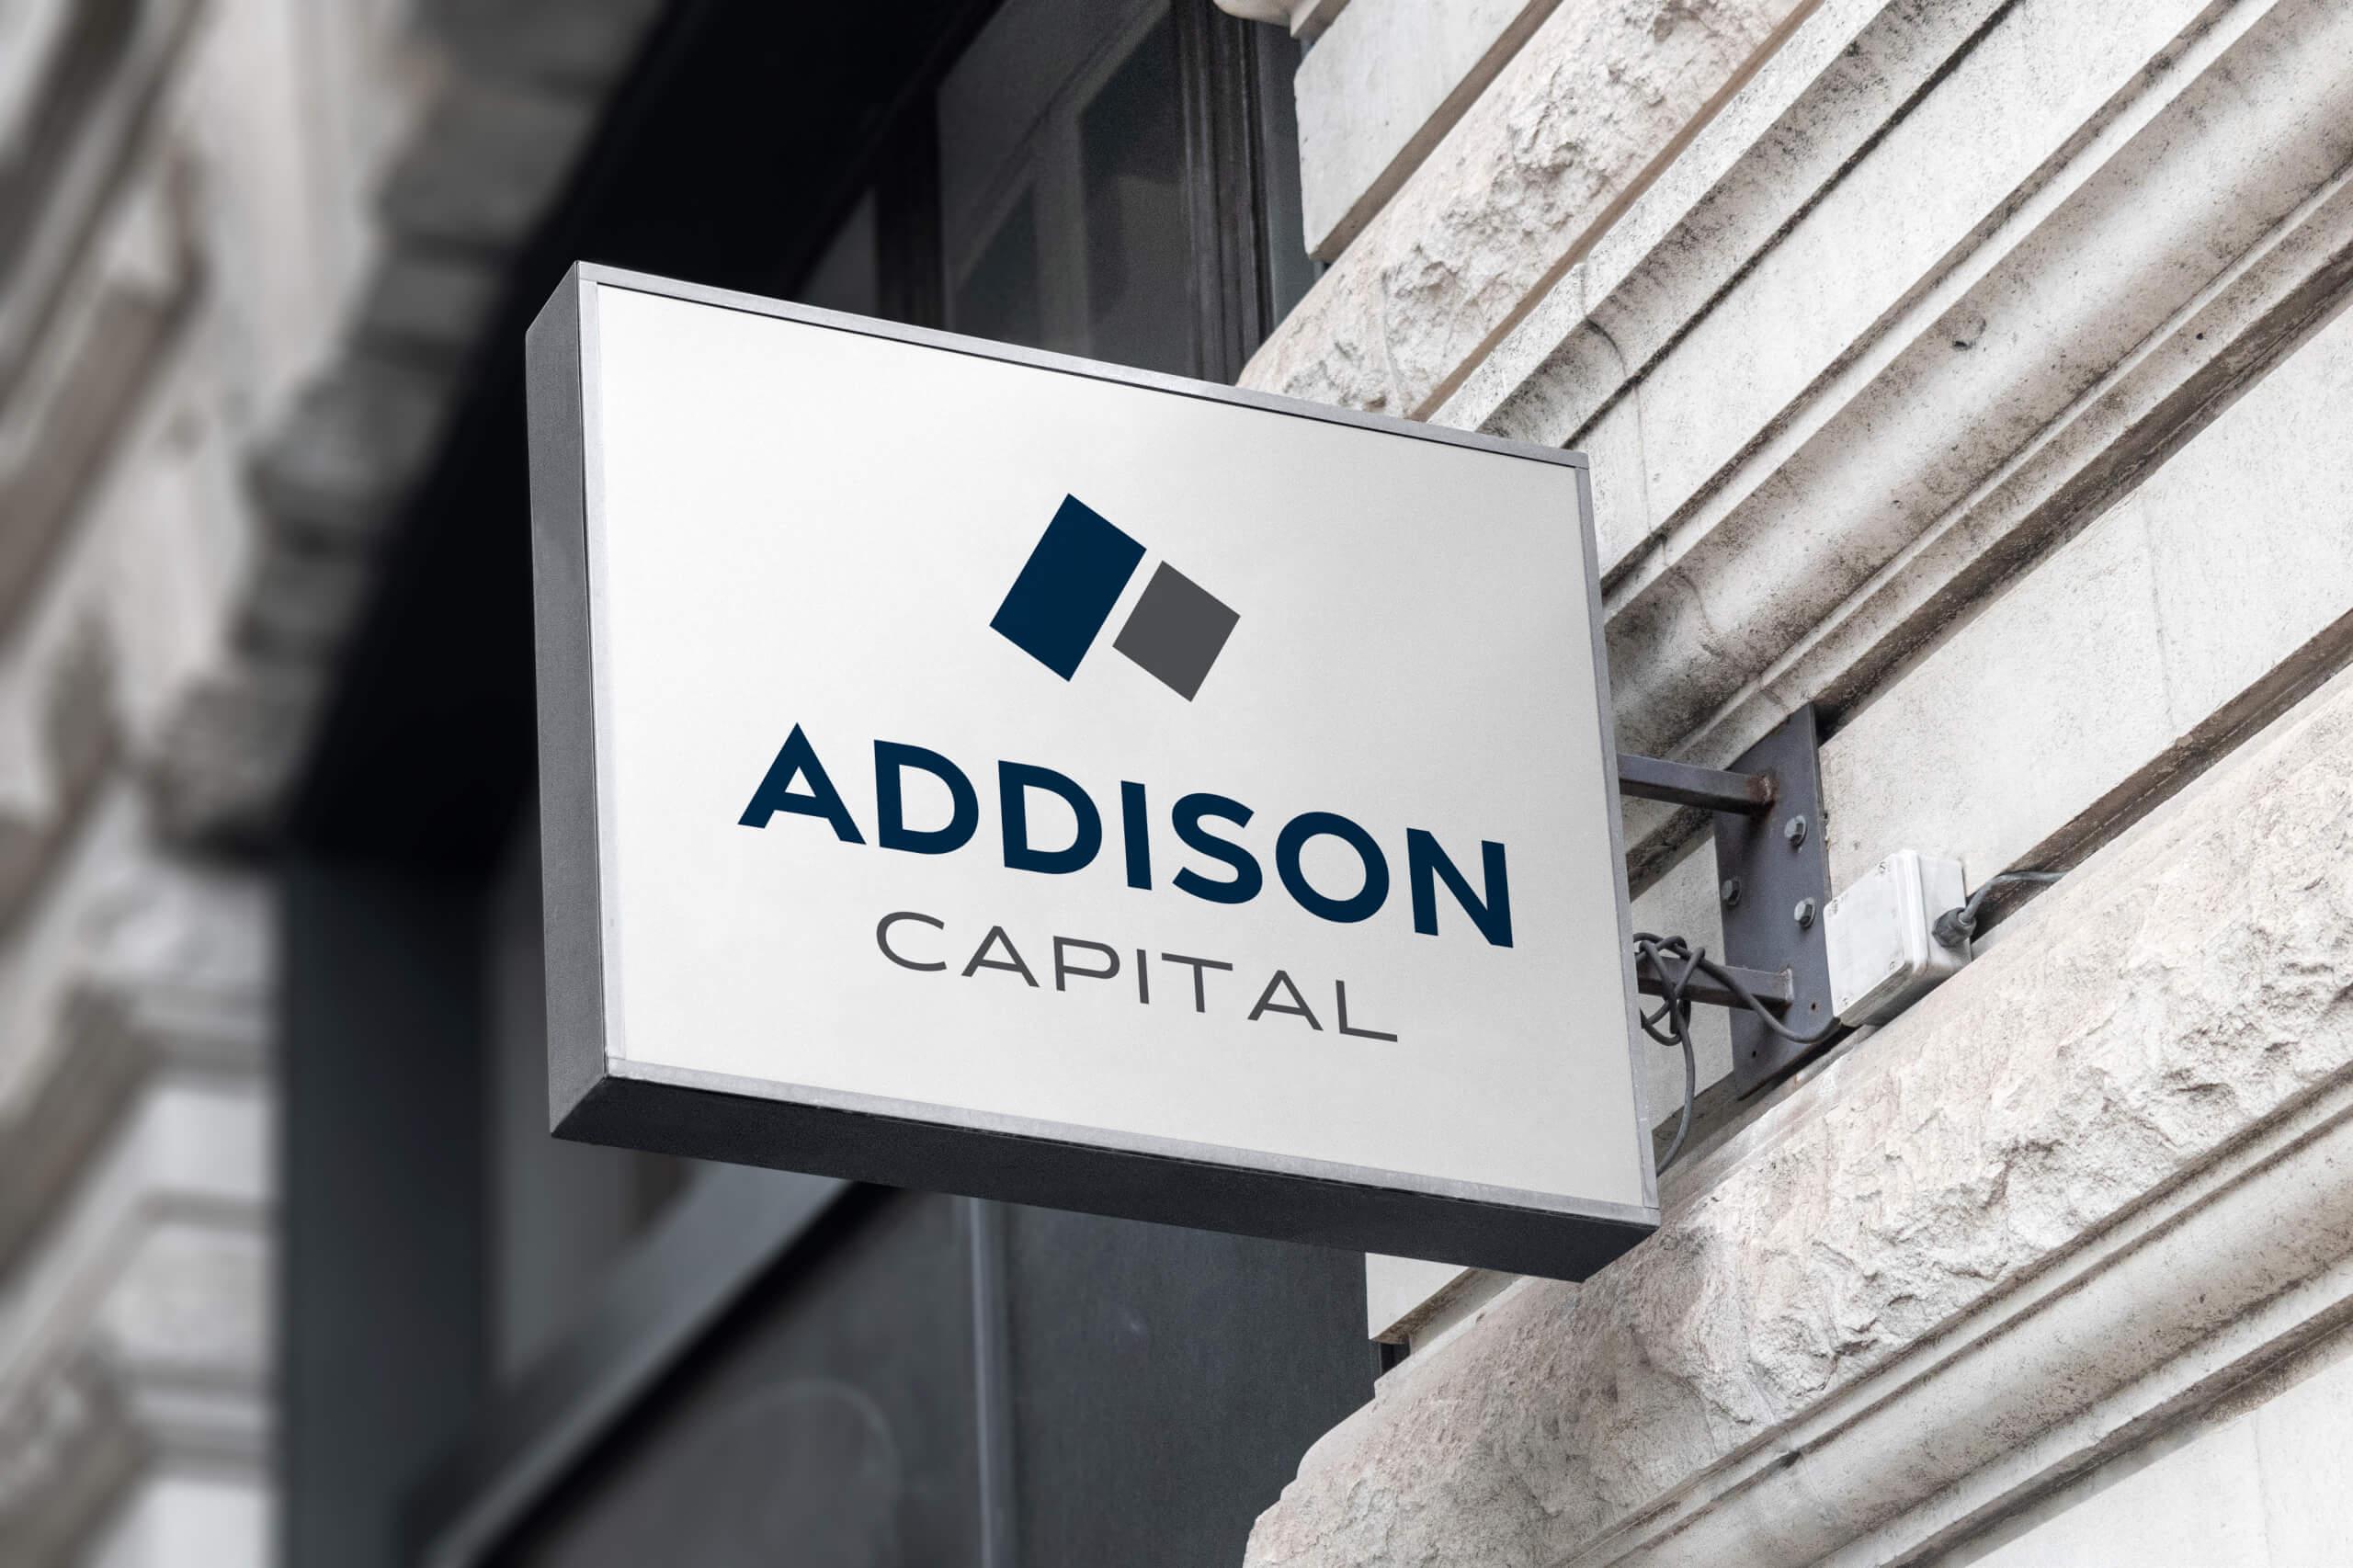 Addison Capital Sign